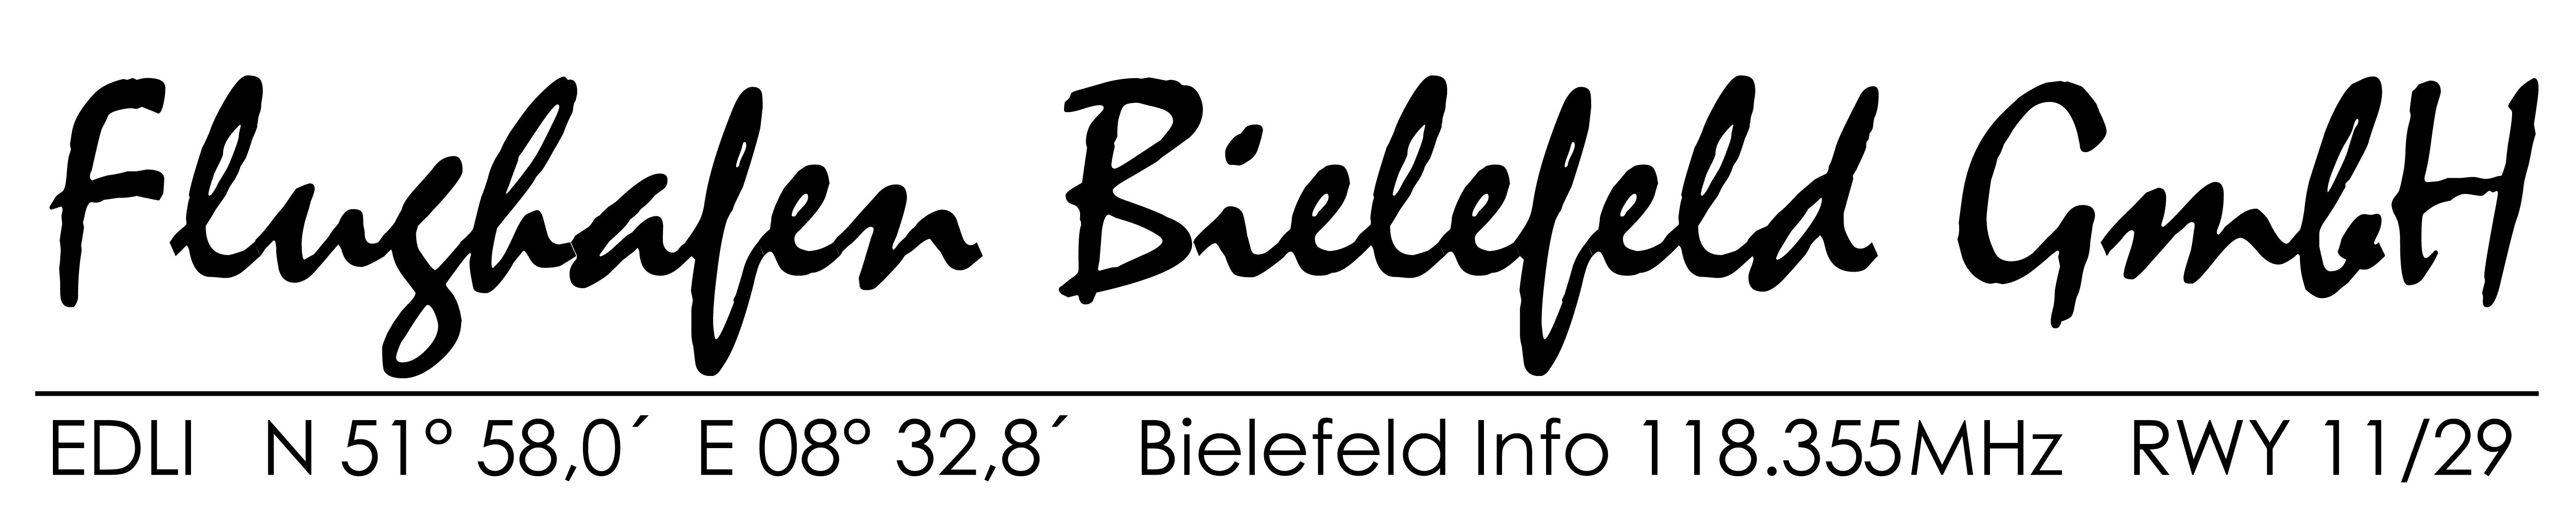 Flugplatz Bielefeld